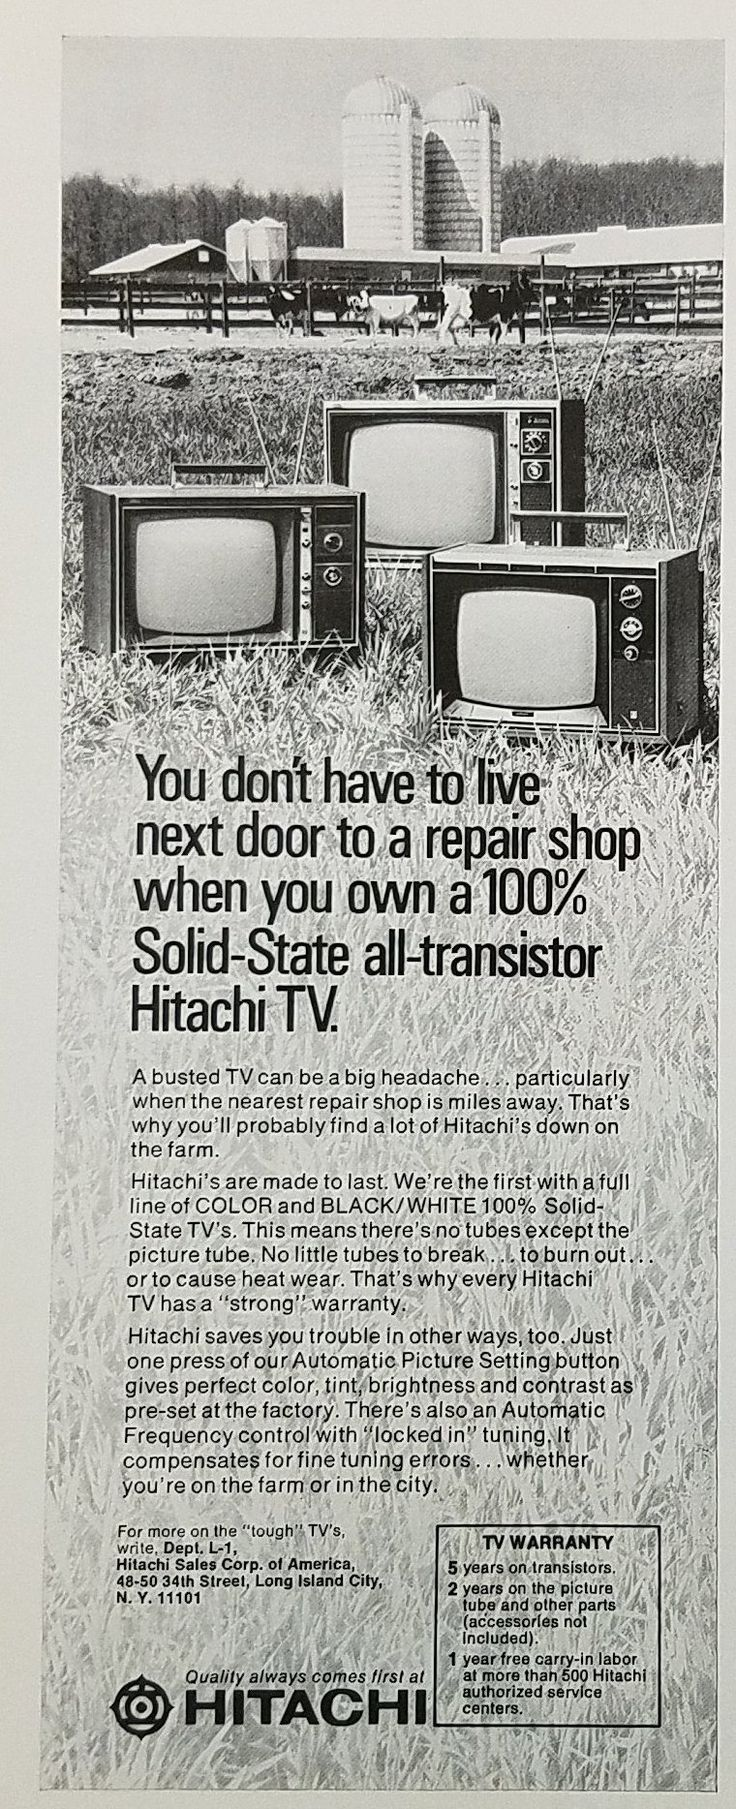 1972 Hitachi Solid State All Transistor Television Vintage Ad - Rural Farm